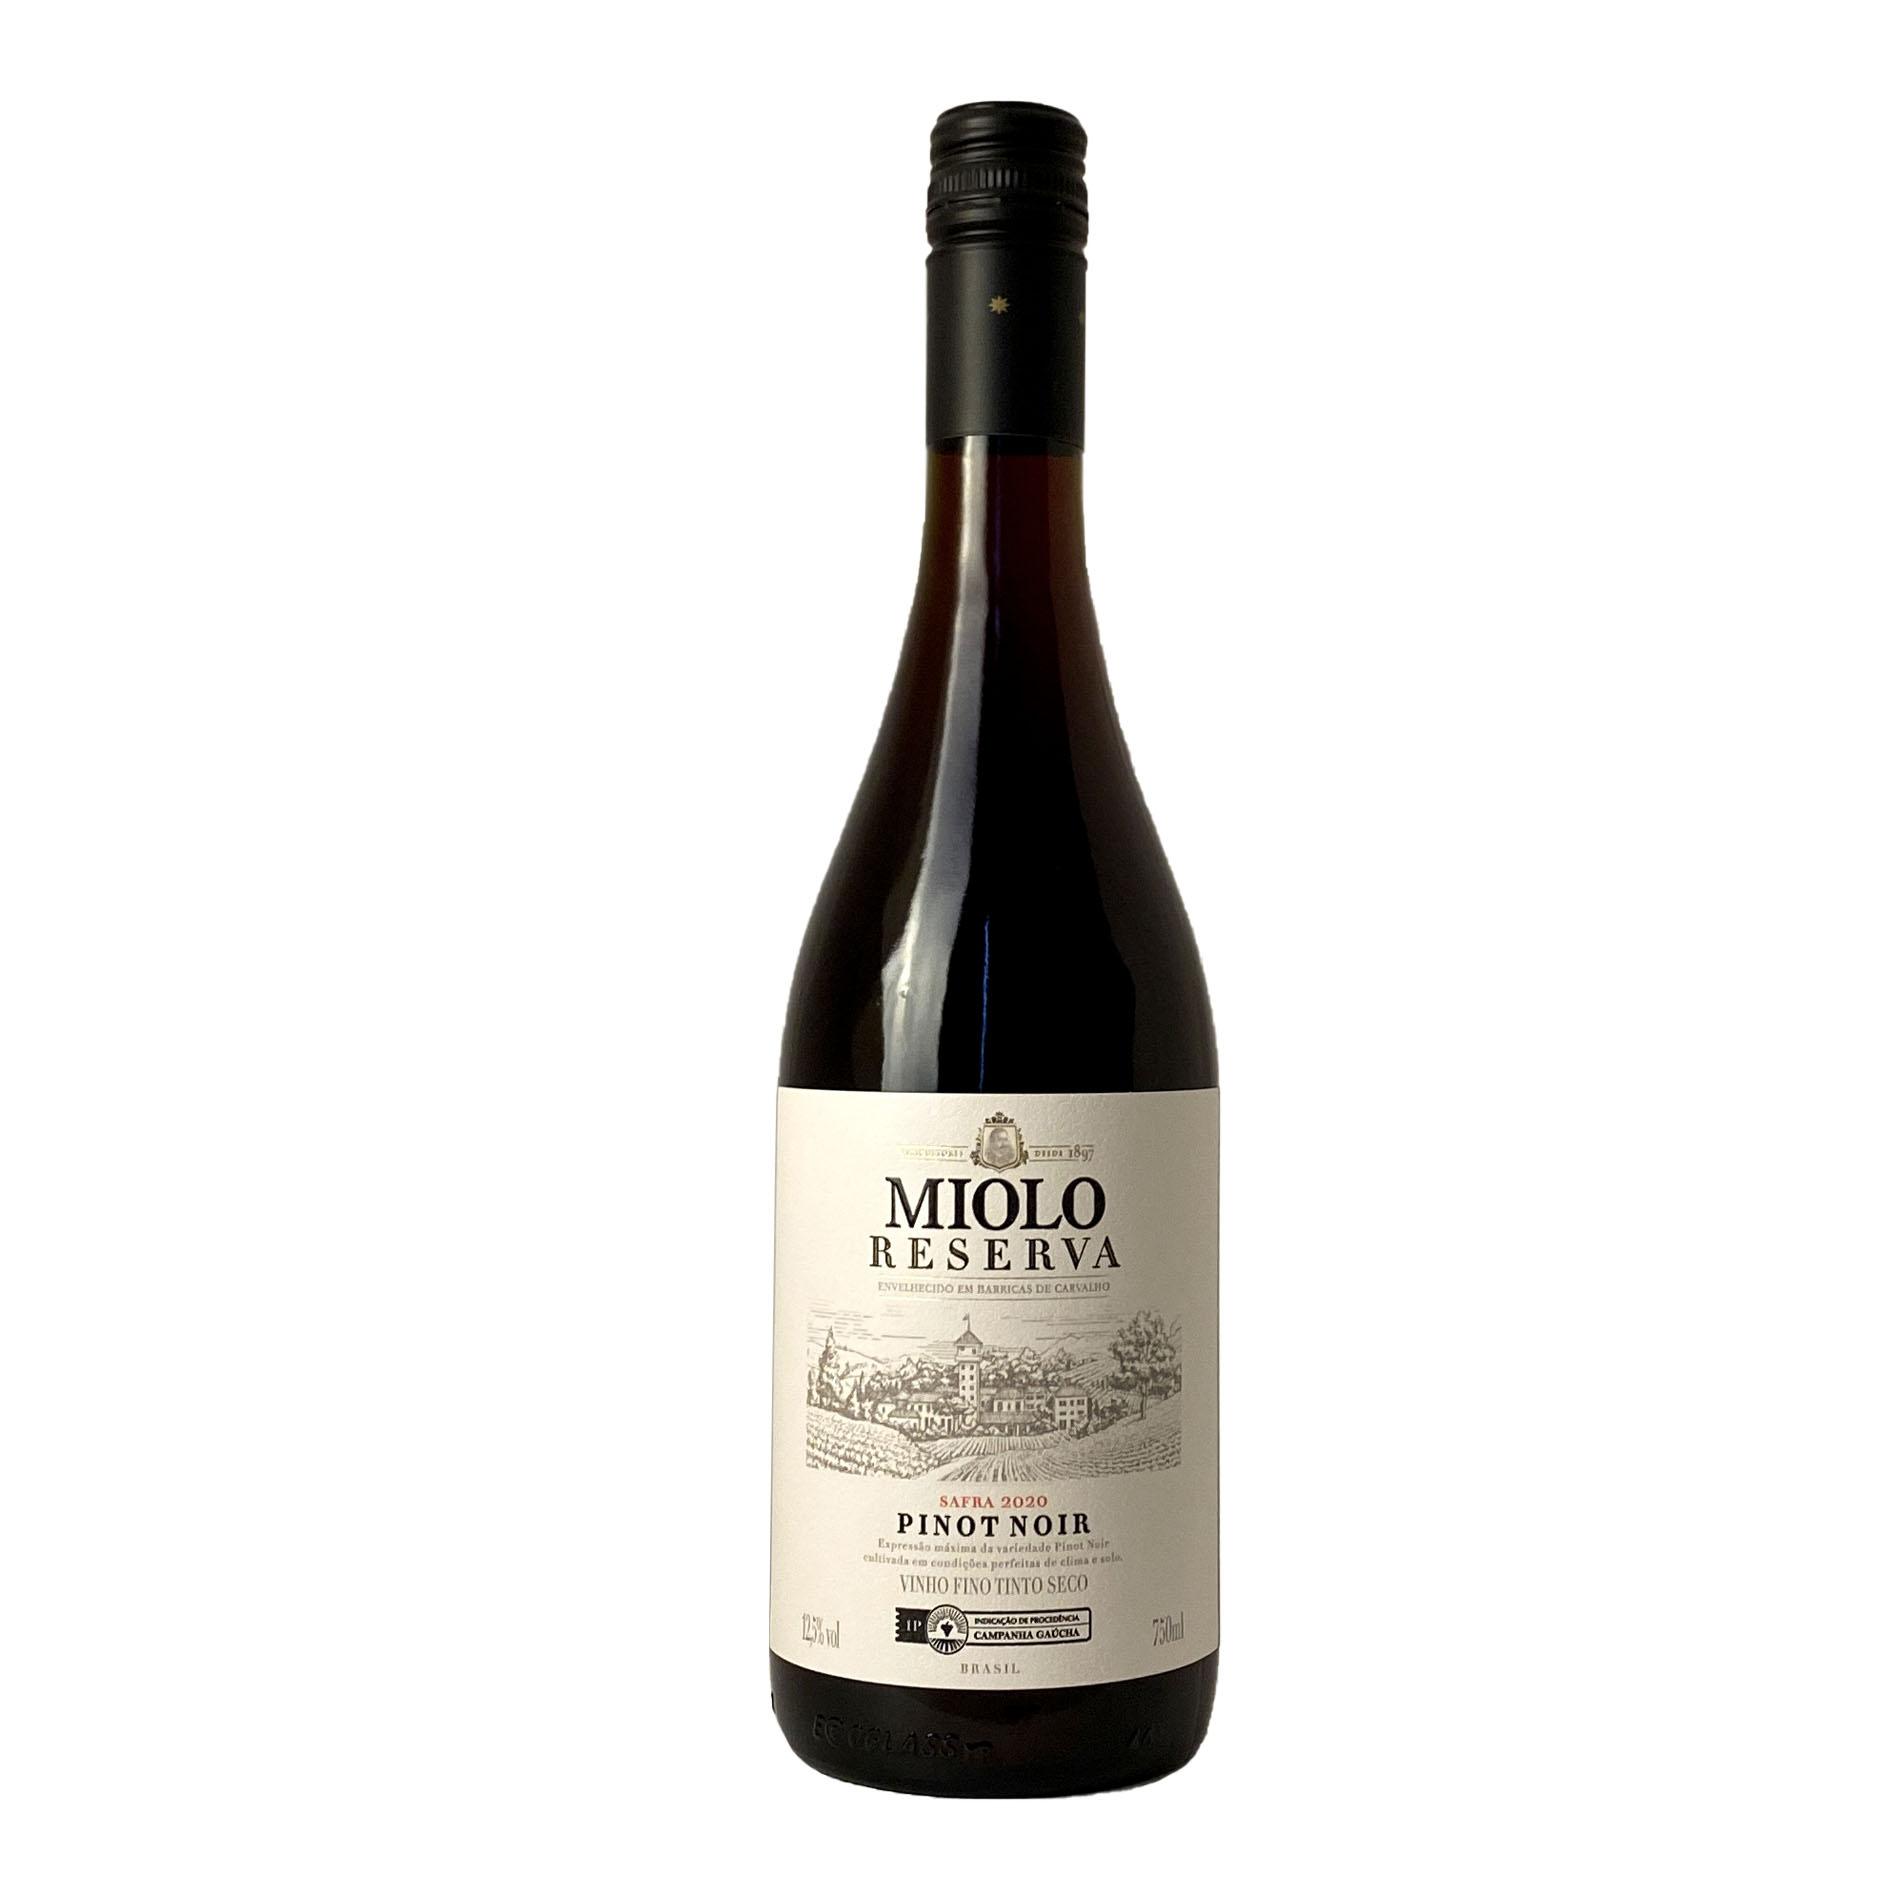 Miolo Reserva Pinot Noir  - Vinerize